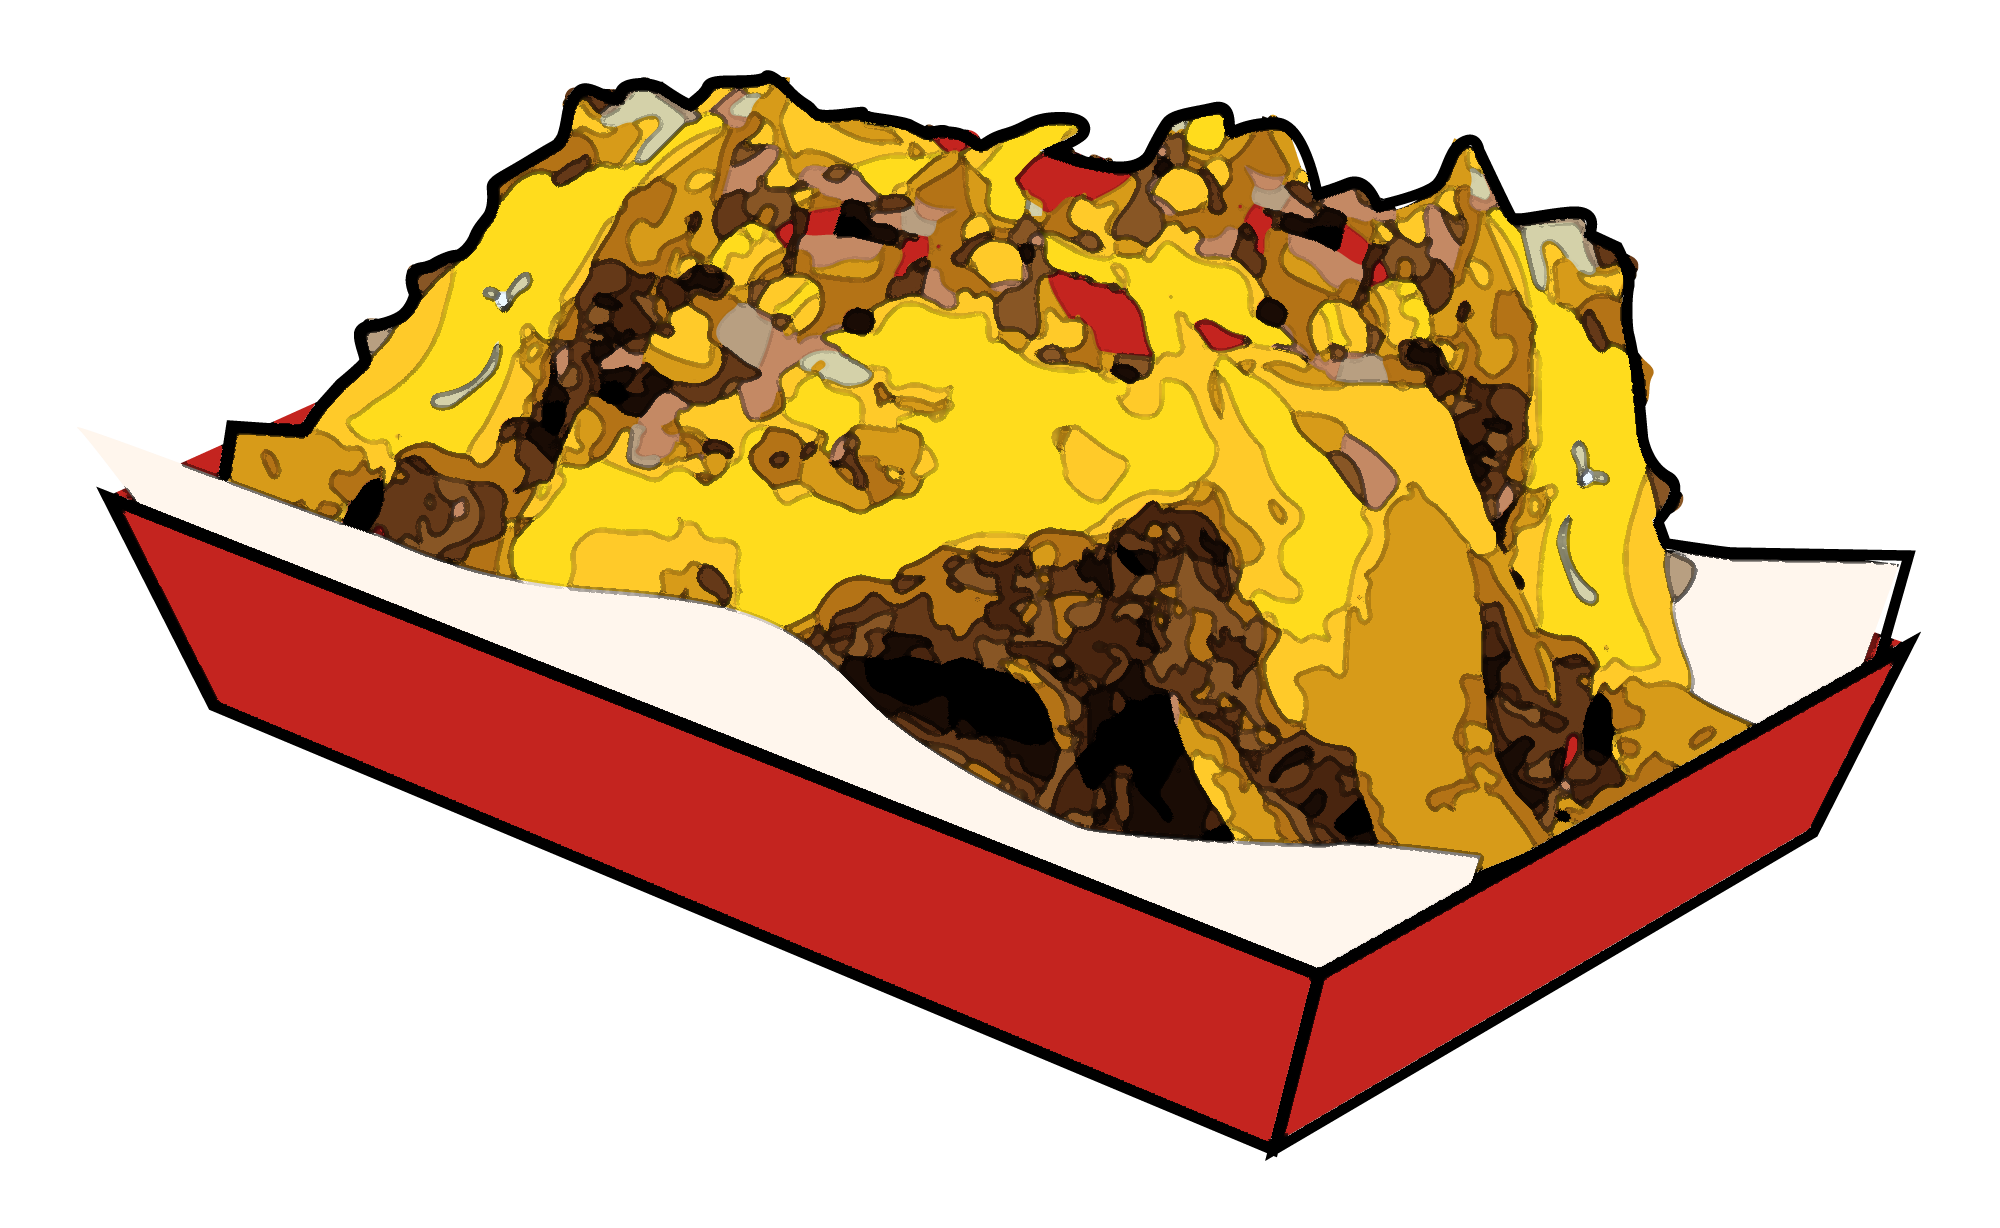 Appetizers clipart nacho, Appetizers nacho Transparent FREE.